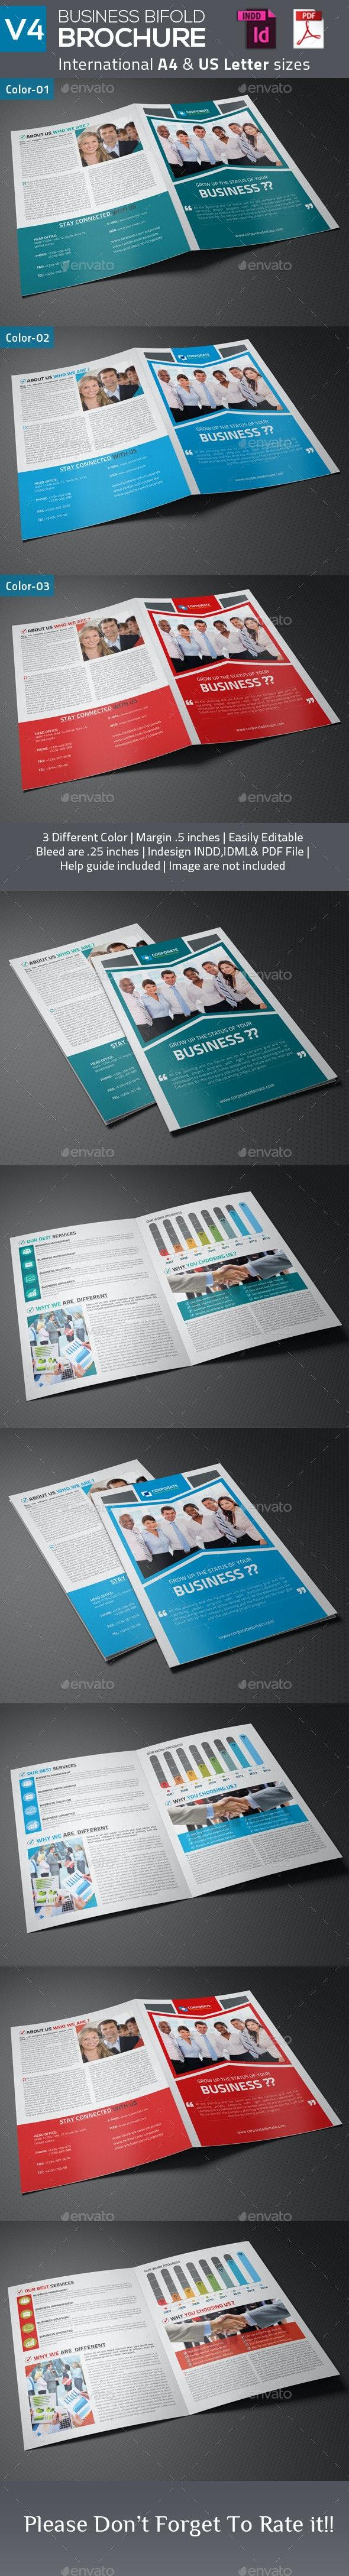 Business Bifold Brochure V4 - Corporate Brochures